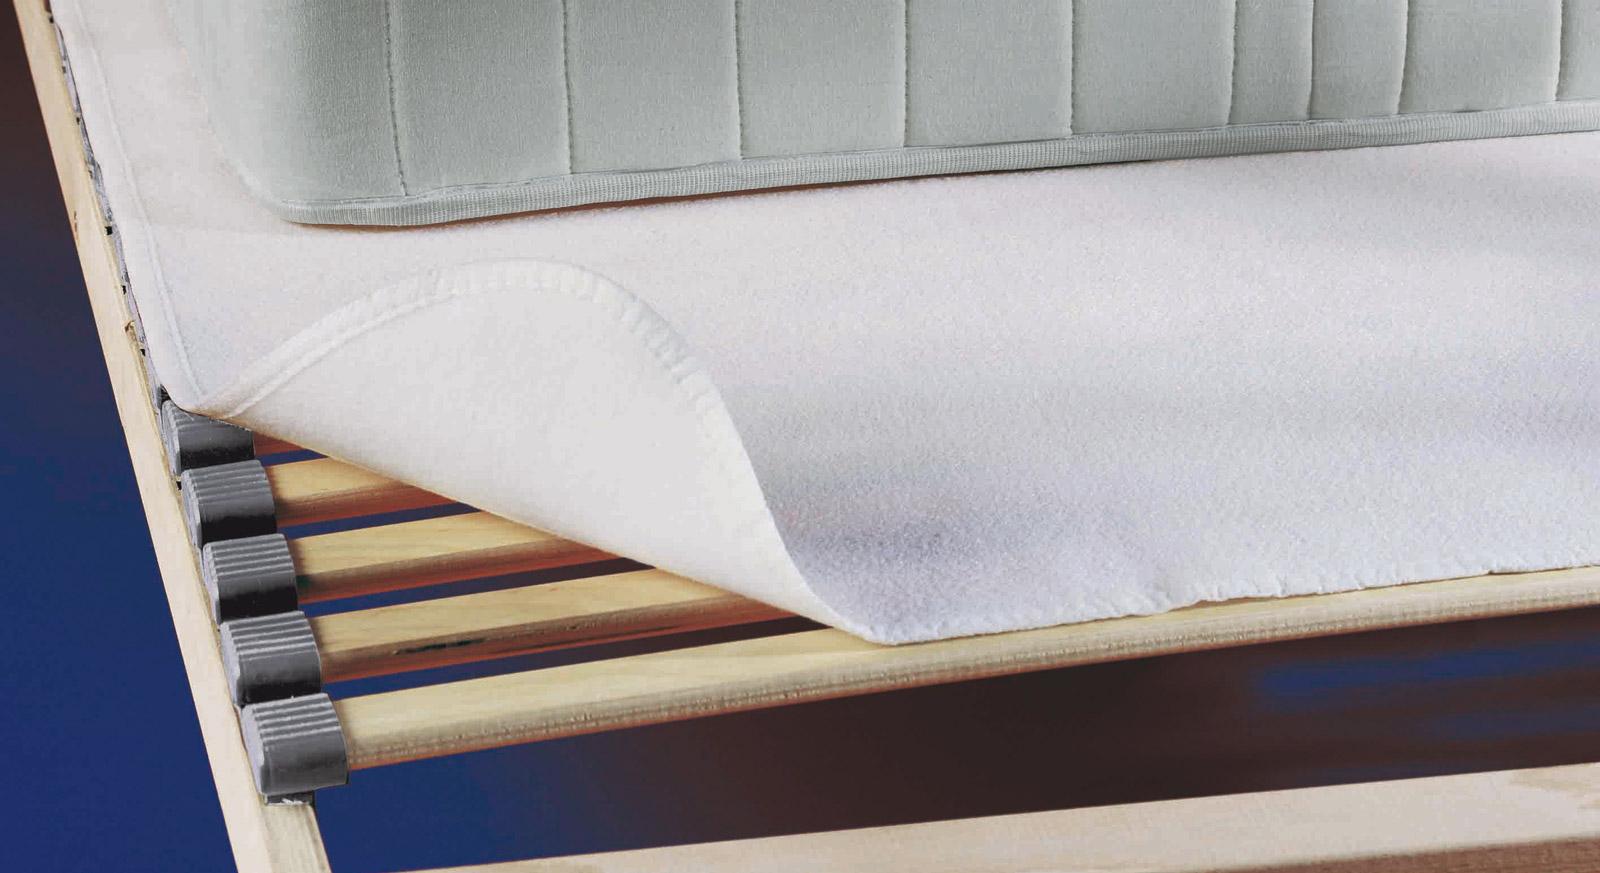 Waschbarer Matratzen-Schoner aus Nadelfilz